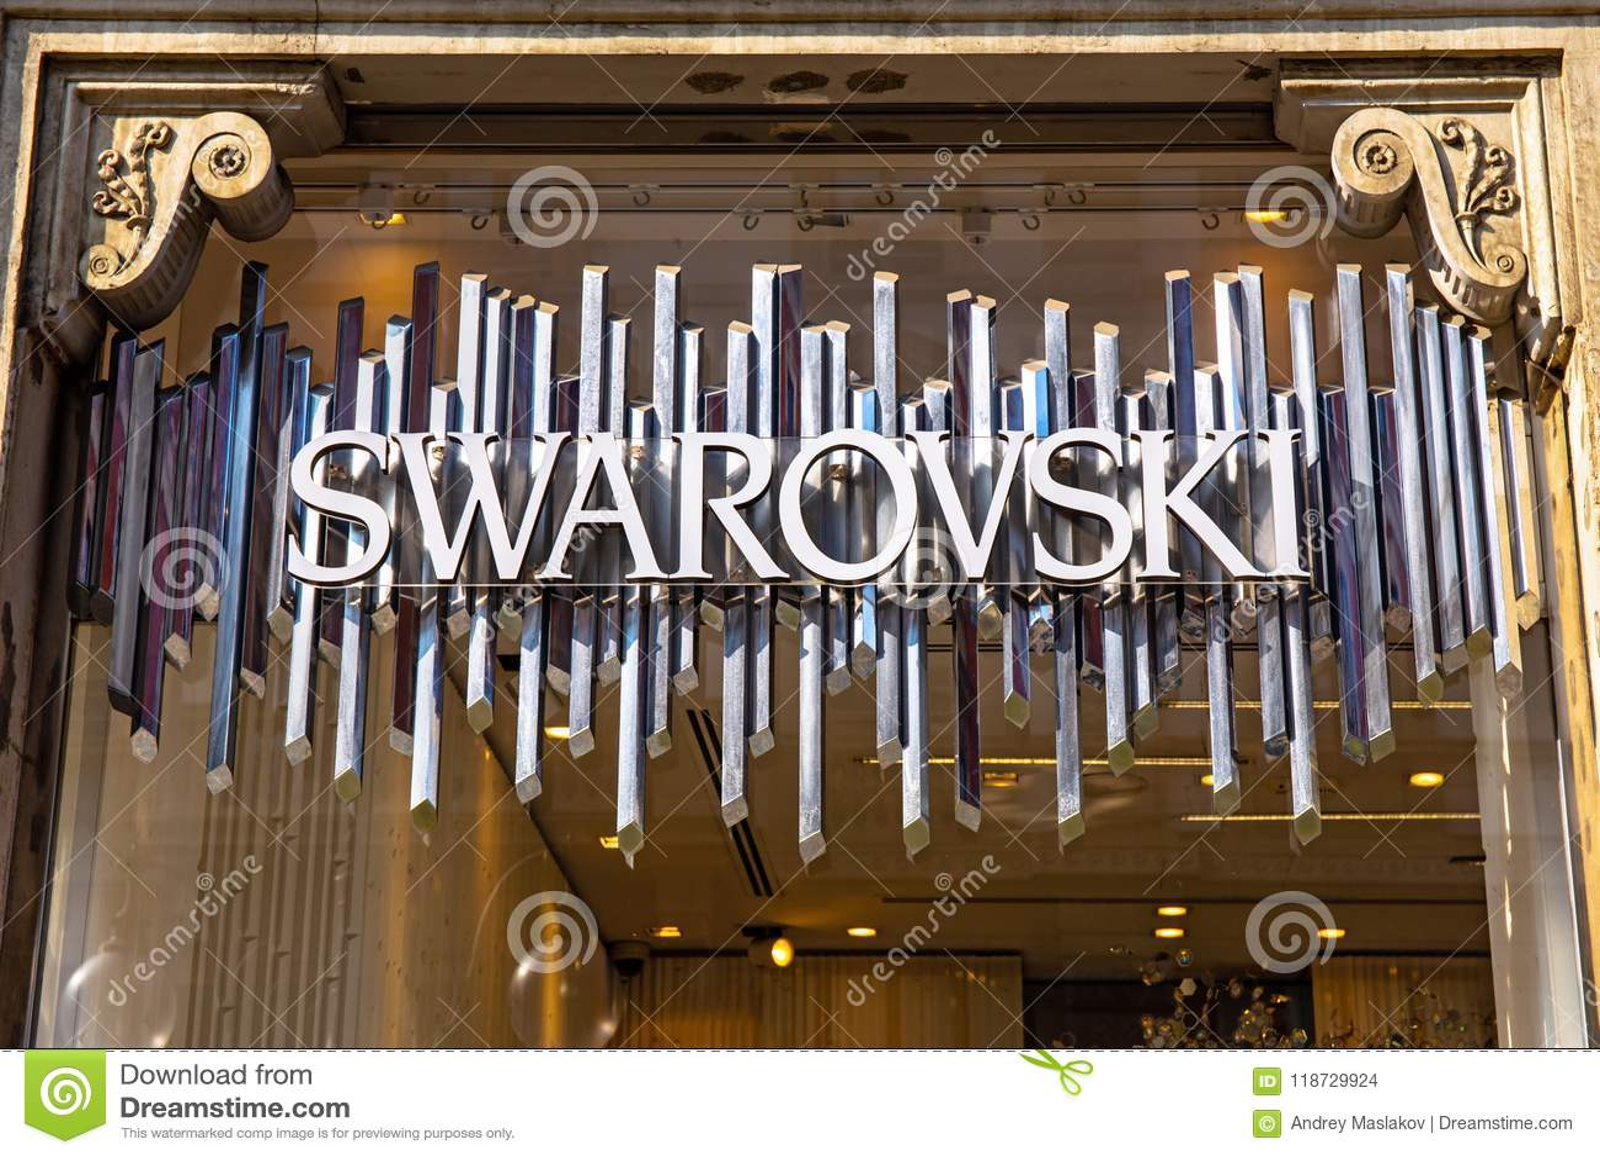 bbf527cc8ce MILAN, ITALY - APRIL 07, 2018: Swarovski store sign in Milan. Swarovski is  an Austrian producer of cut lead glass, headquartered in Wattens, Austria.